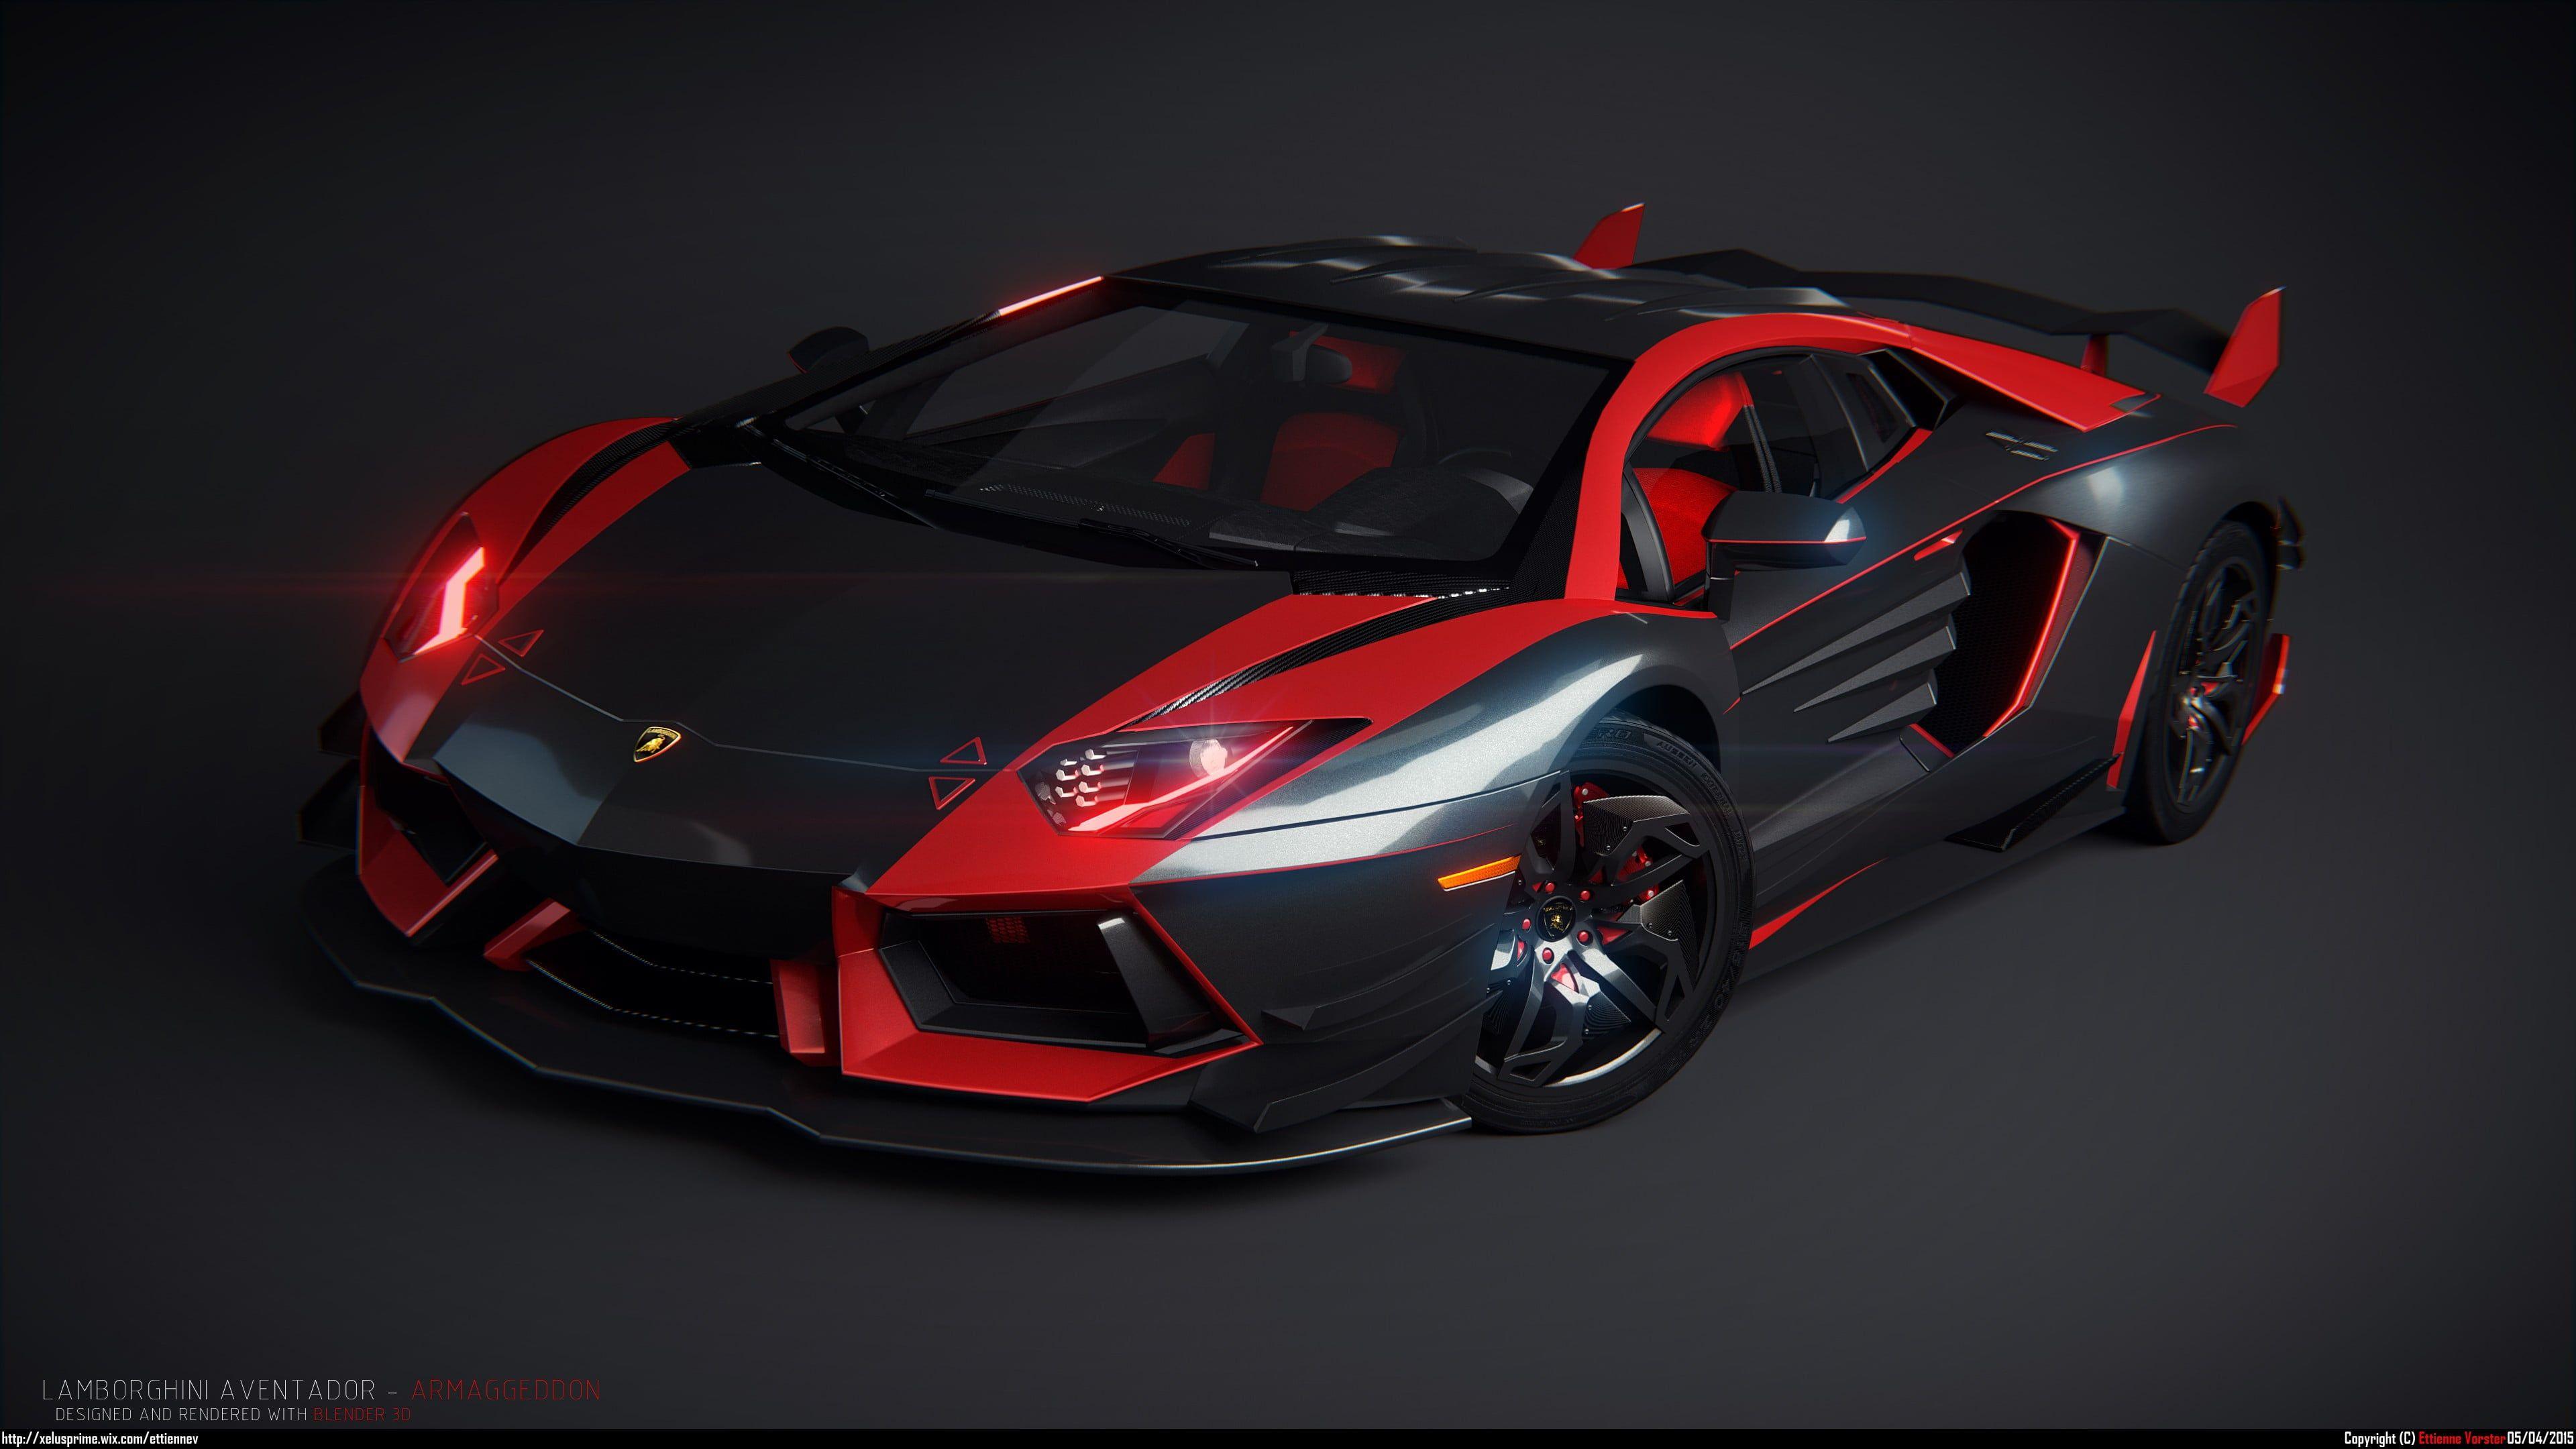 Wallpaper Black And Red Coupe Lamborghini Car Lamborghini Aventador Kendaraan